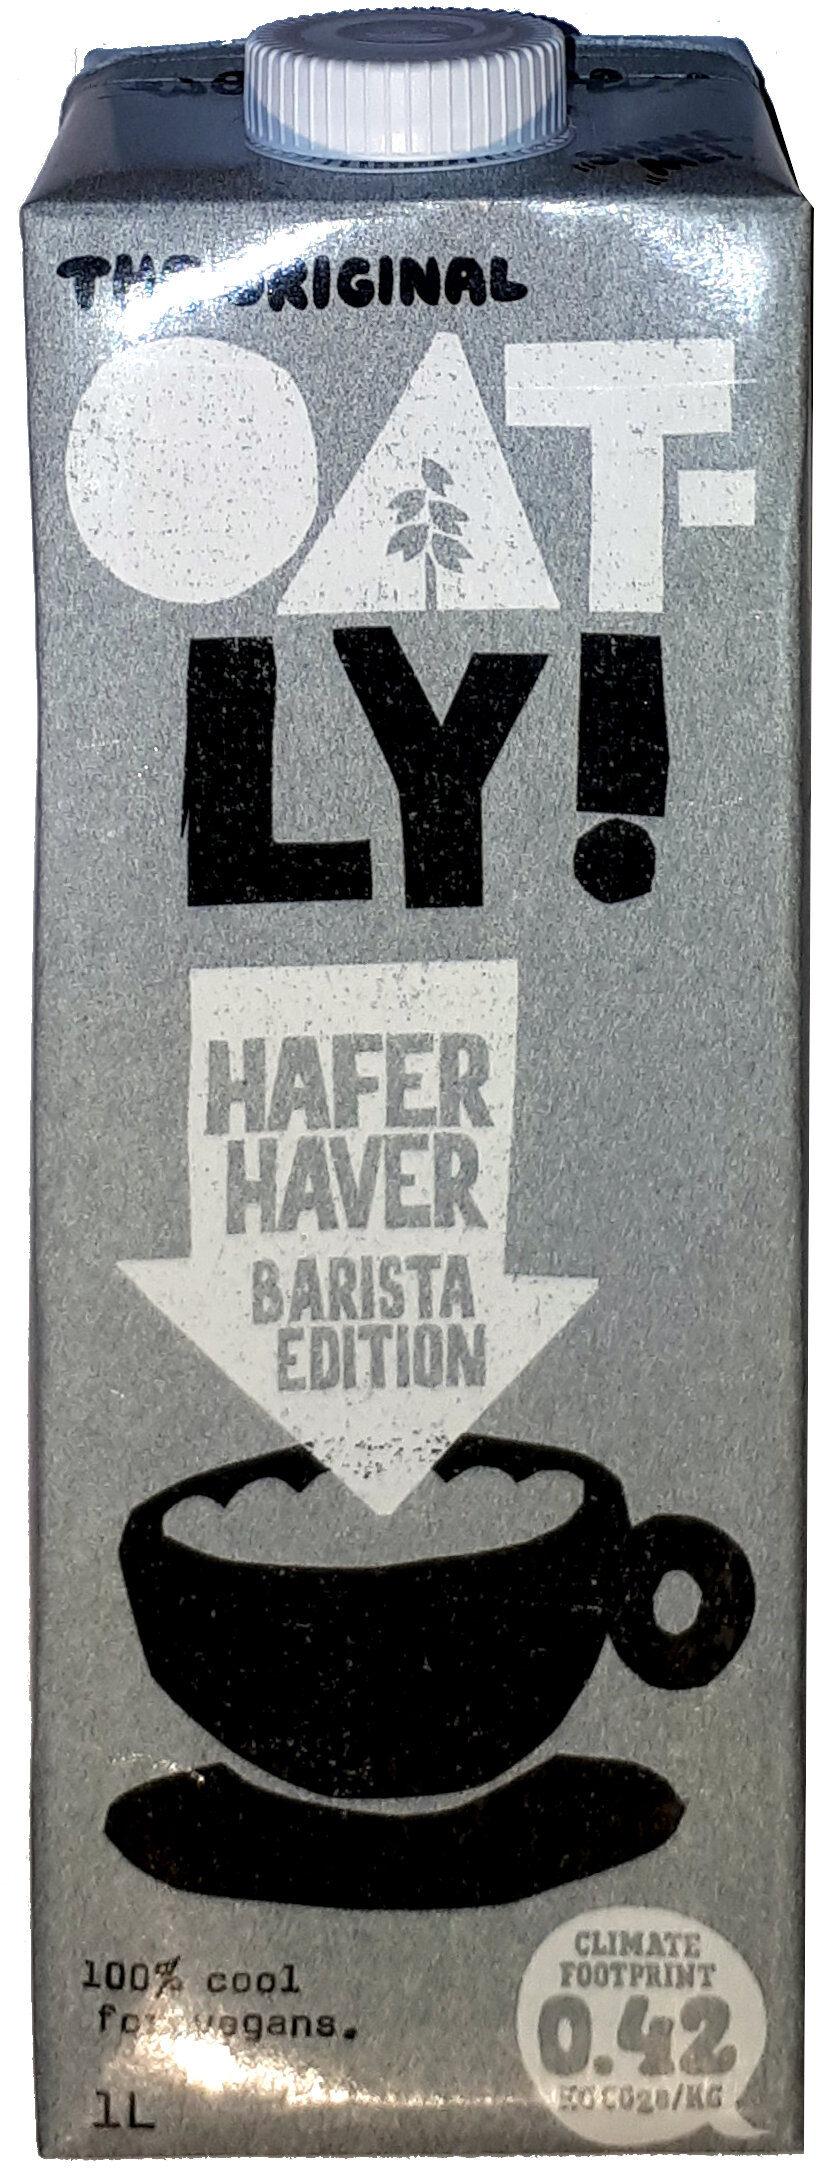 Haferdrink Barista-Edition - Produkt - de